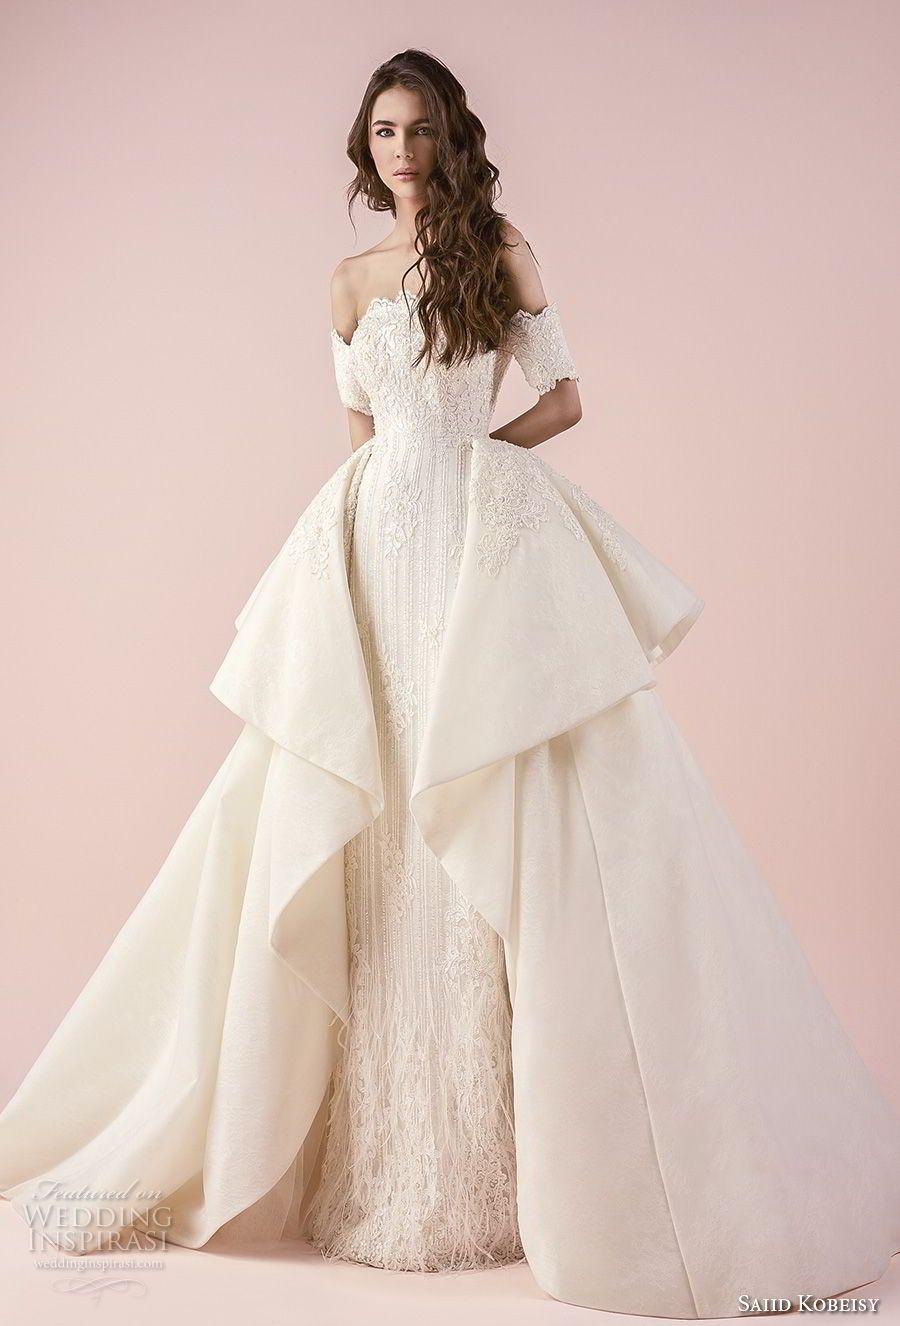 5093f3ac6939 saiid kobeisy 2018 bridal half sleeves off the shoulder straight across  scallop neckline full embellishment elegant princess sheath wedding dress a  line ...